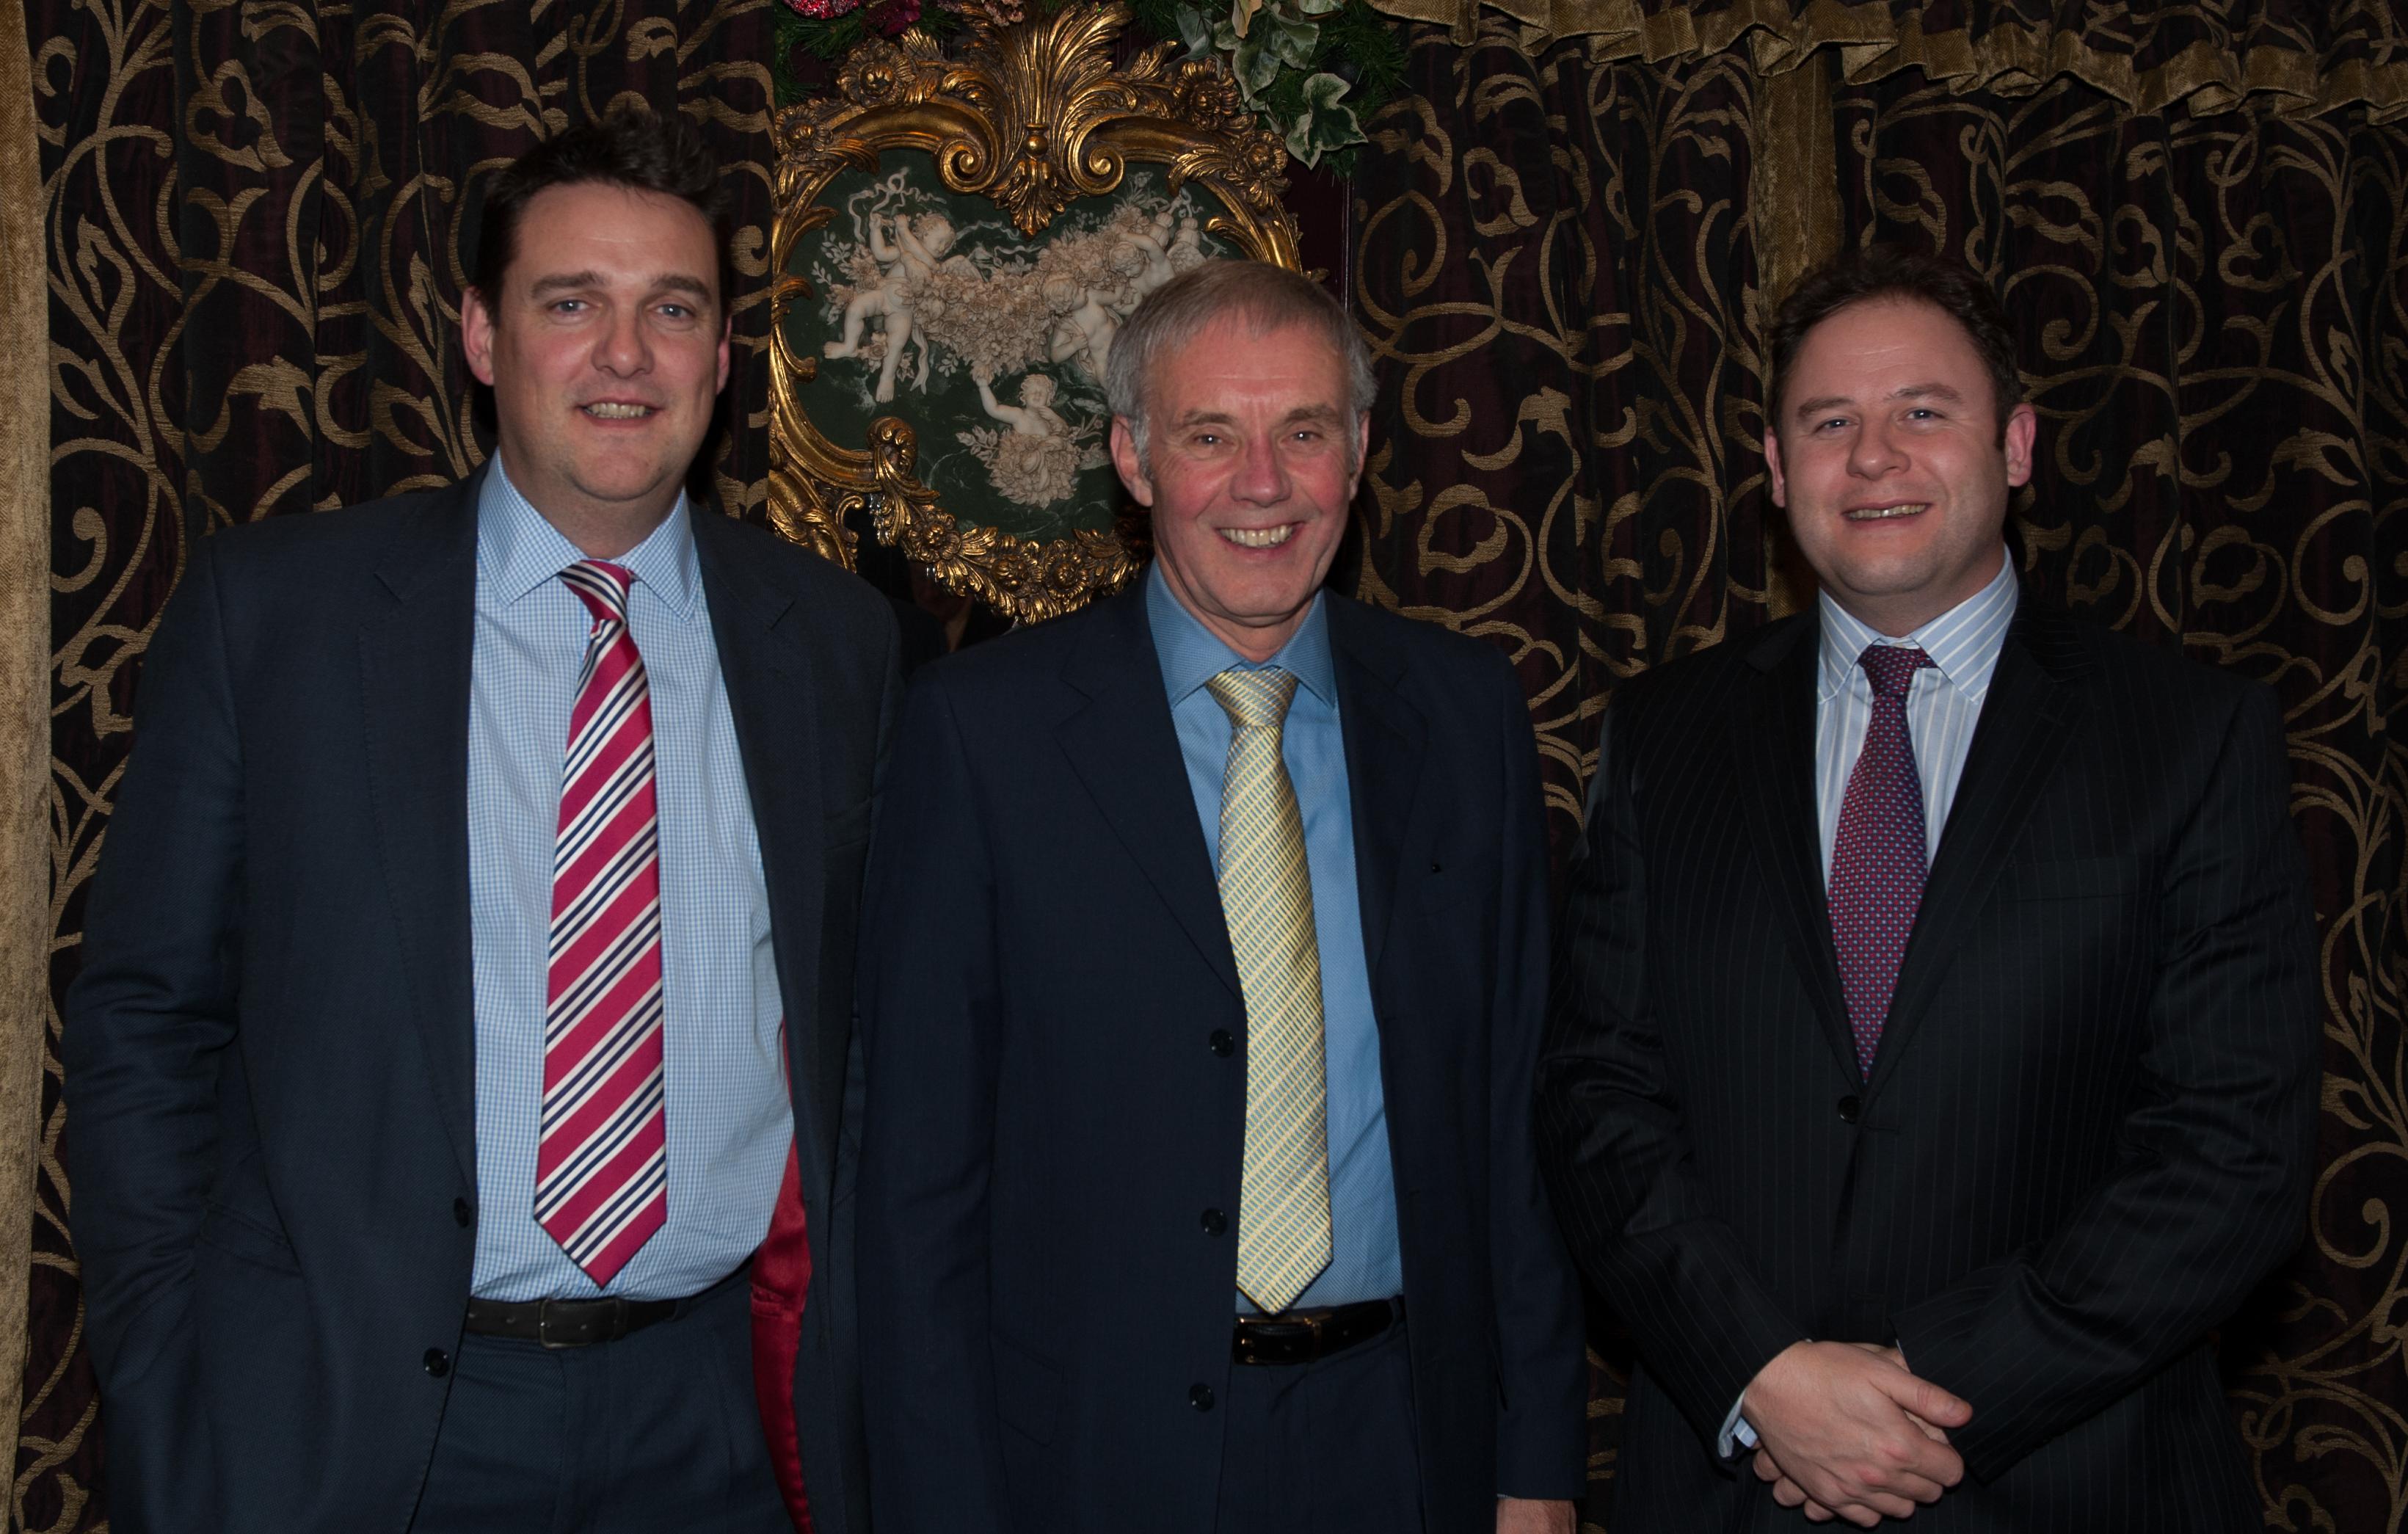 Genial Left Is Richard Ellis, Centre Is David Hughes, Right Is Tom Ellis. Tom